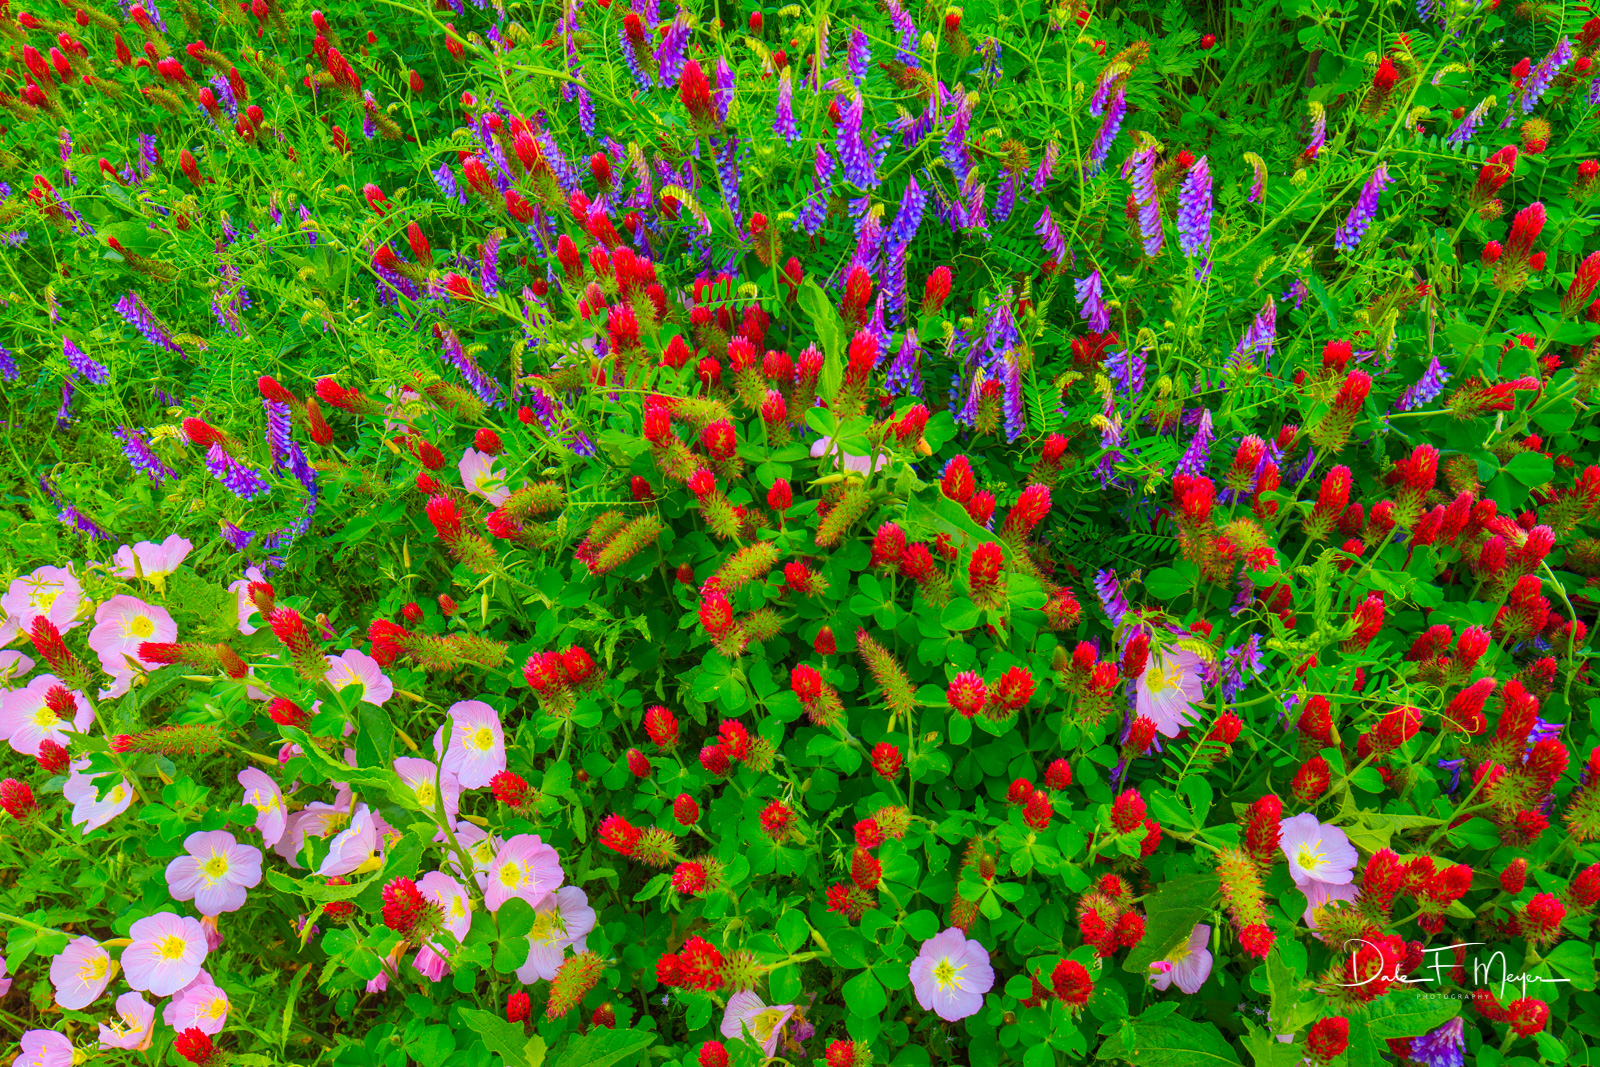 Central Arkansas, Showy Evening Primrose, blue bells, crimson clover, flowers, photo